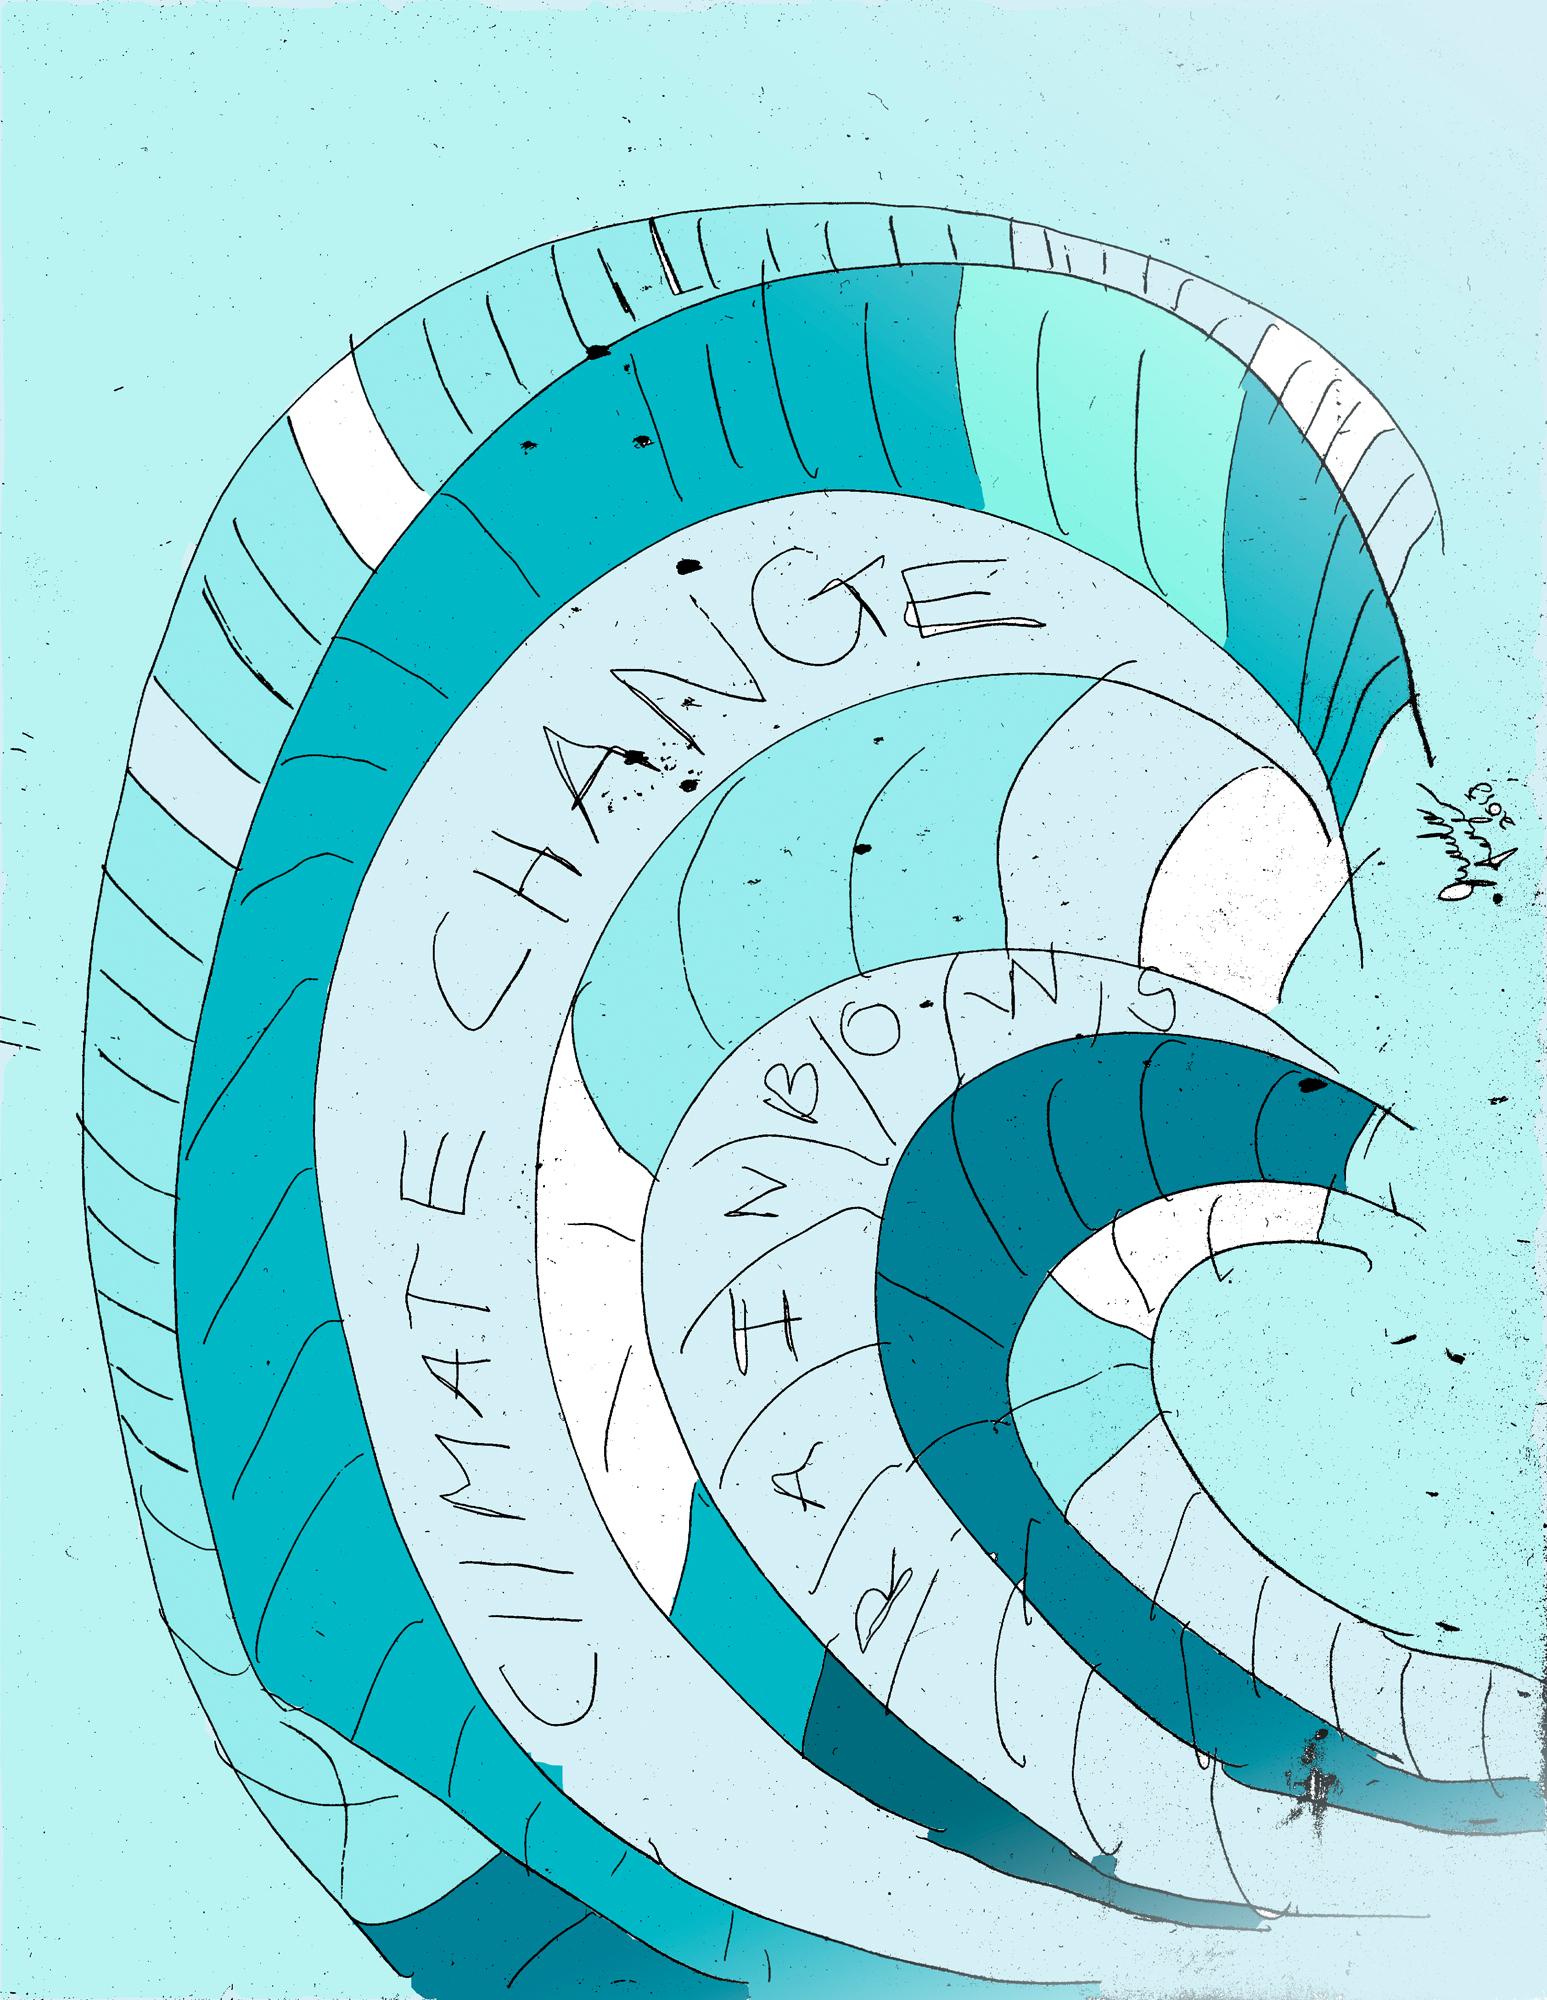 climatechangerainbow.jpg